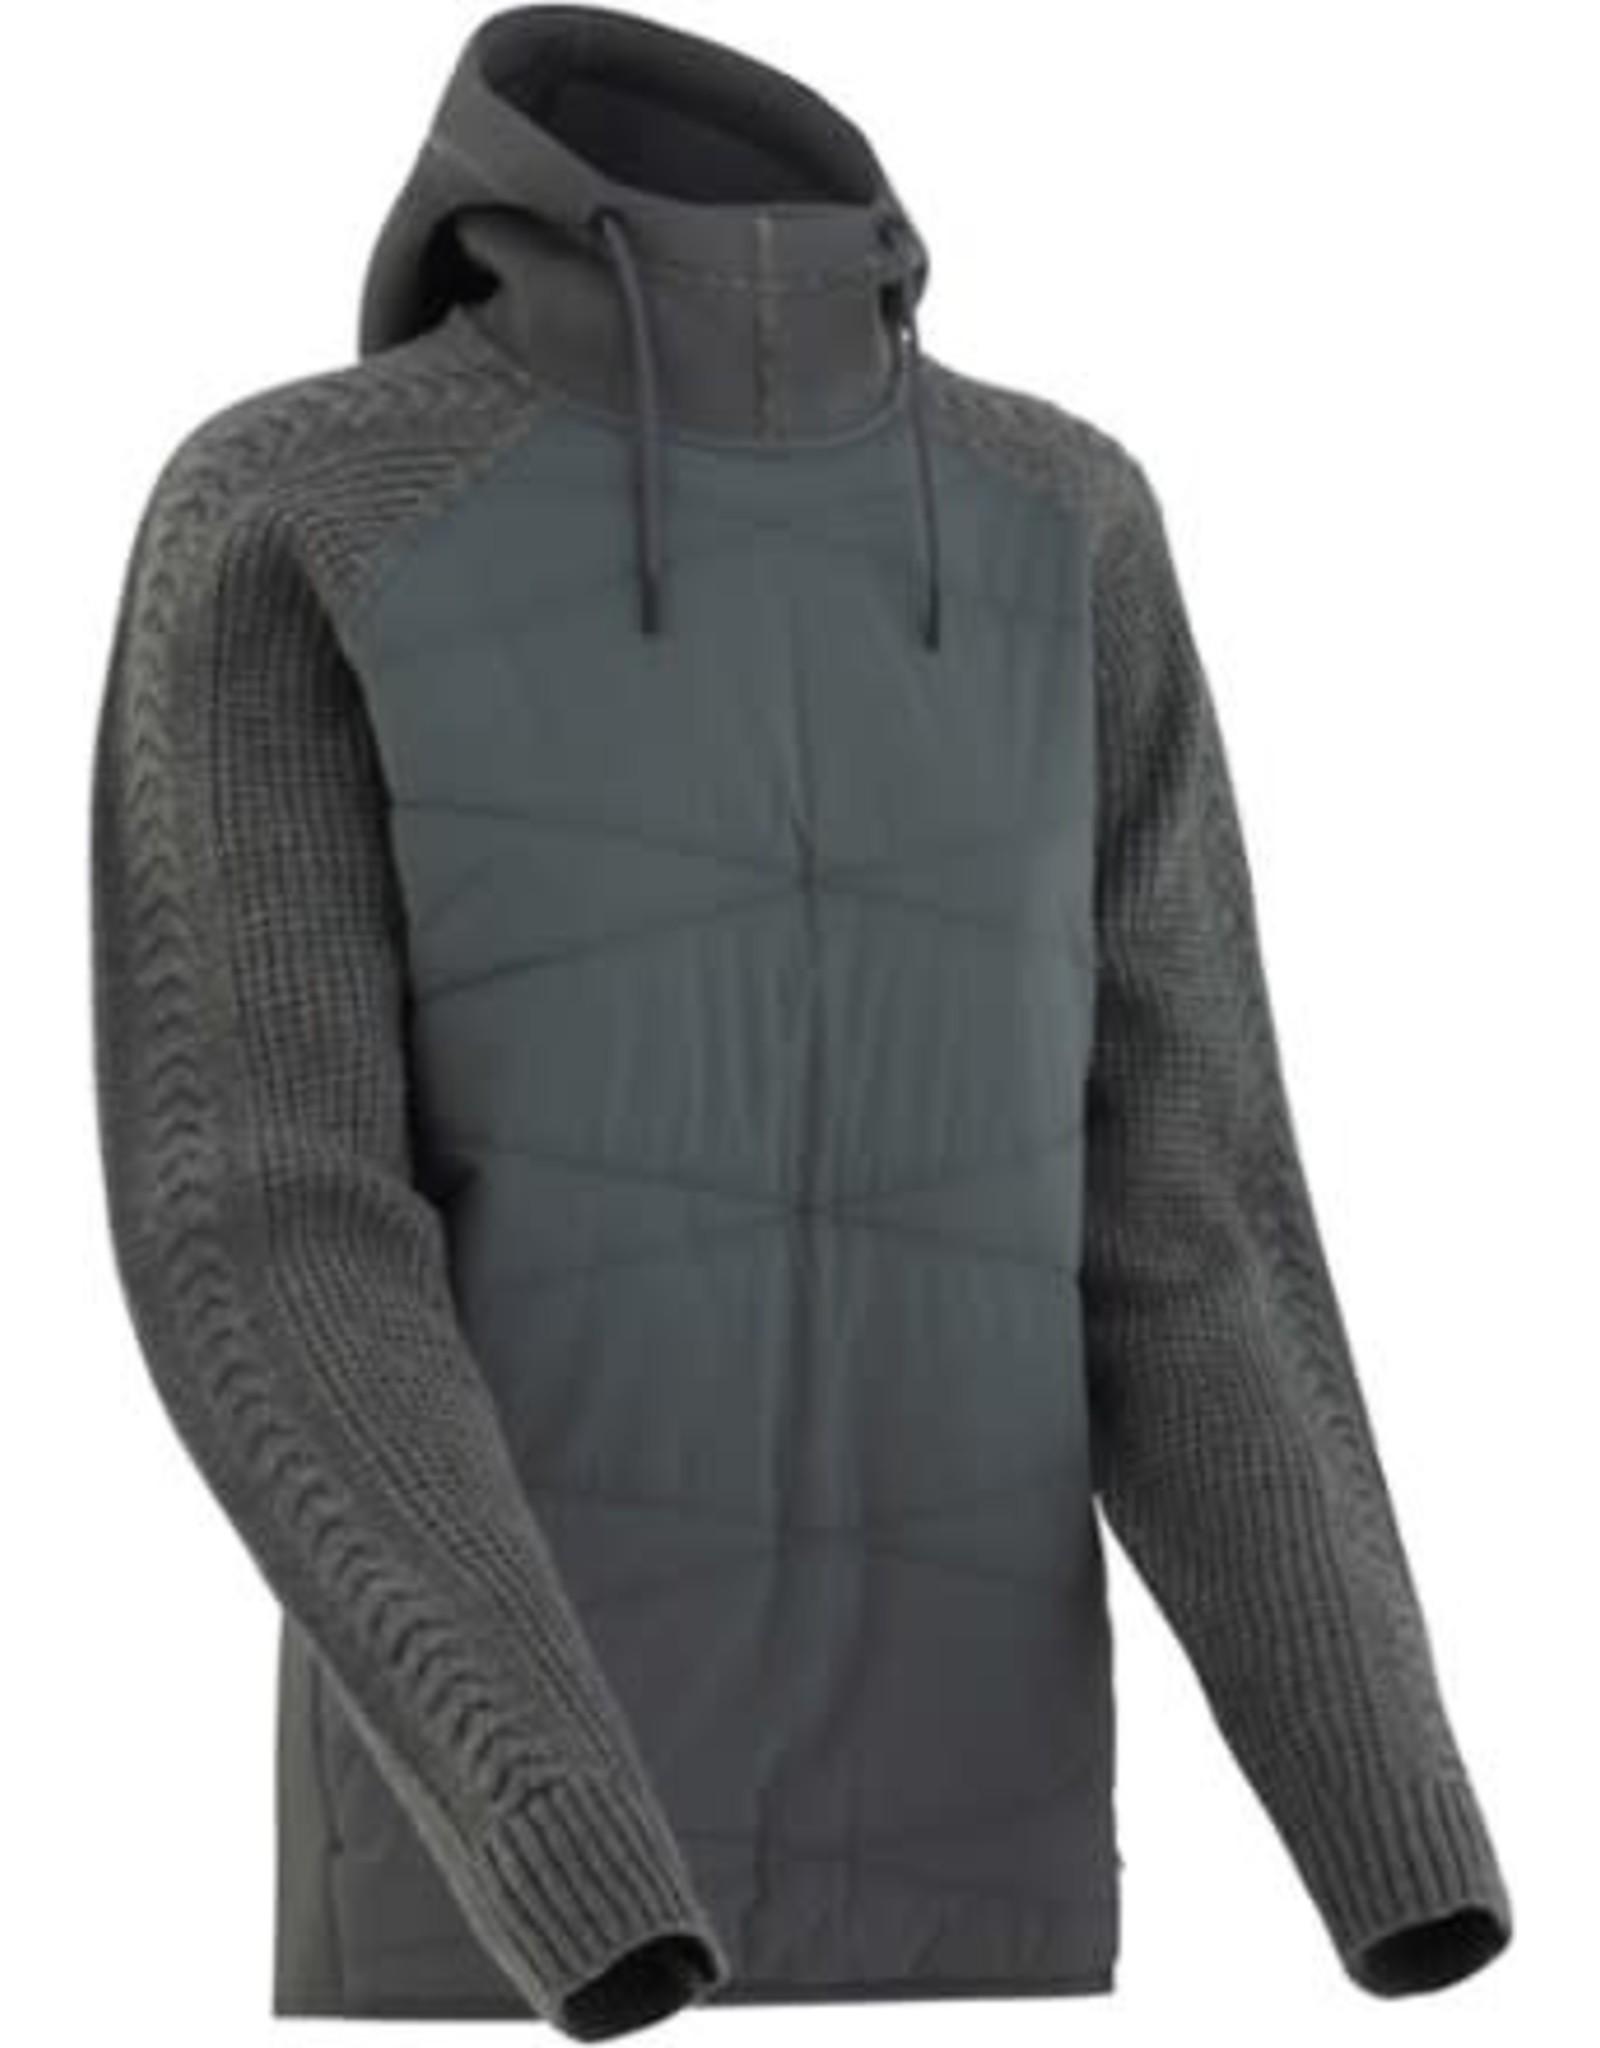 Kari Traa Faere Pullover